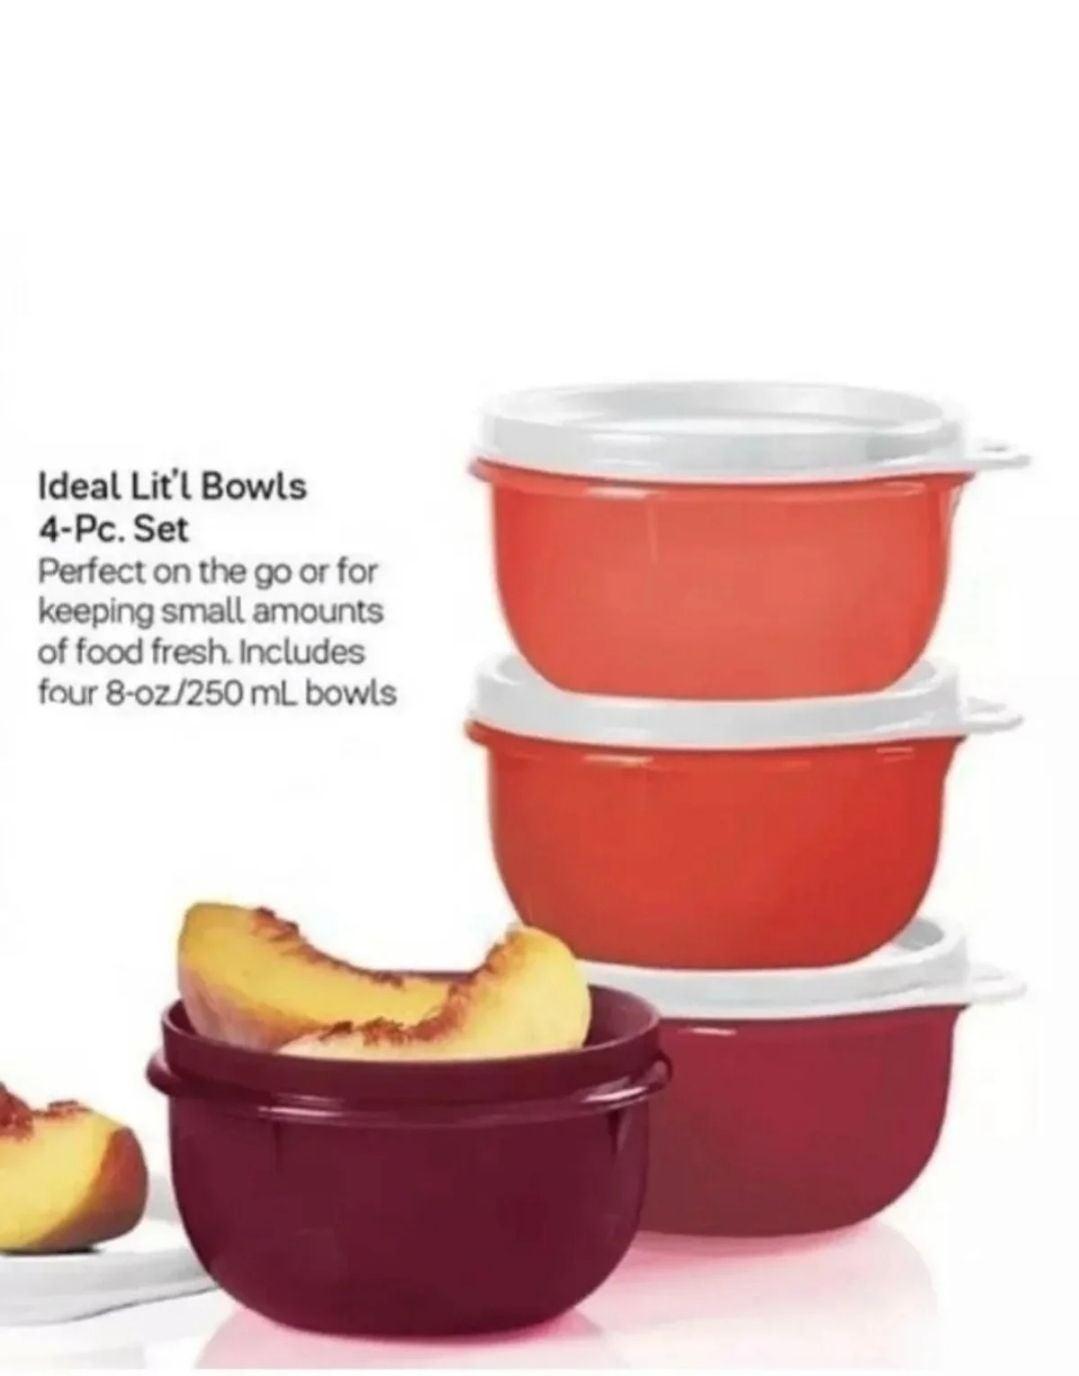 Tupperware Ideal Little bowls Shades